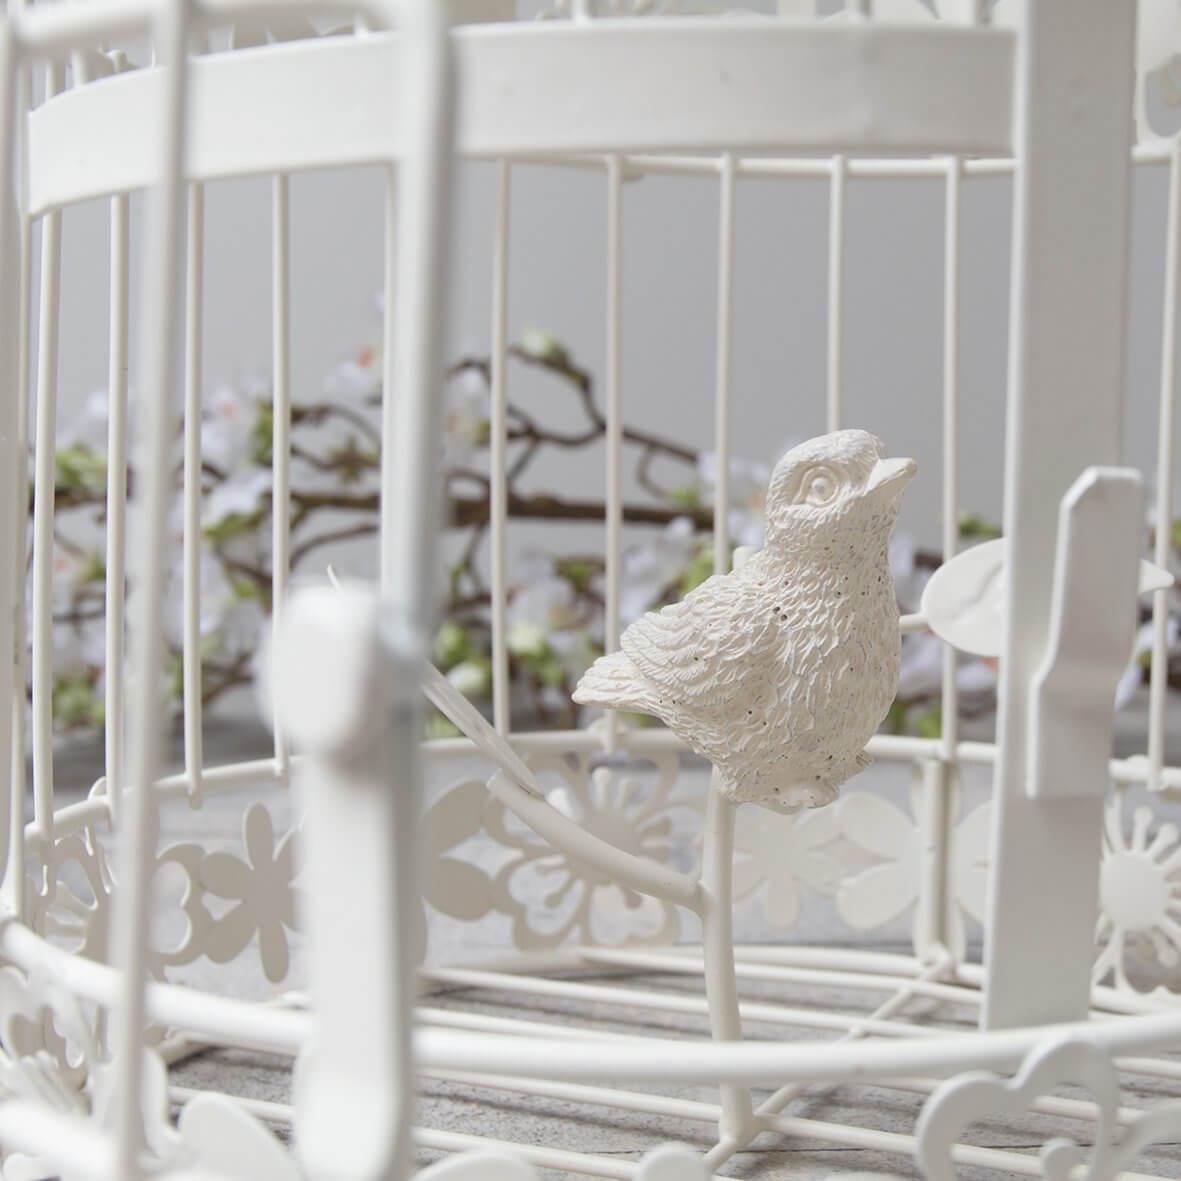 Ivory Birdcage with decorative bird inside